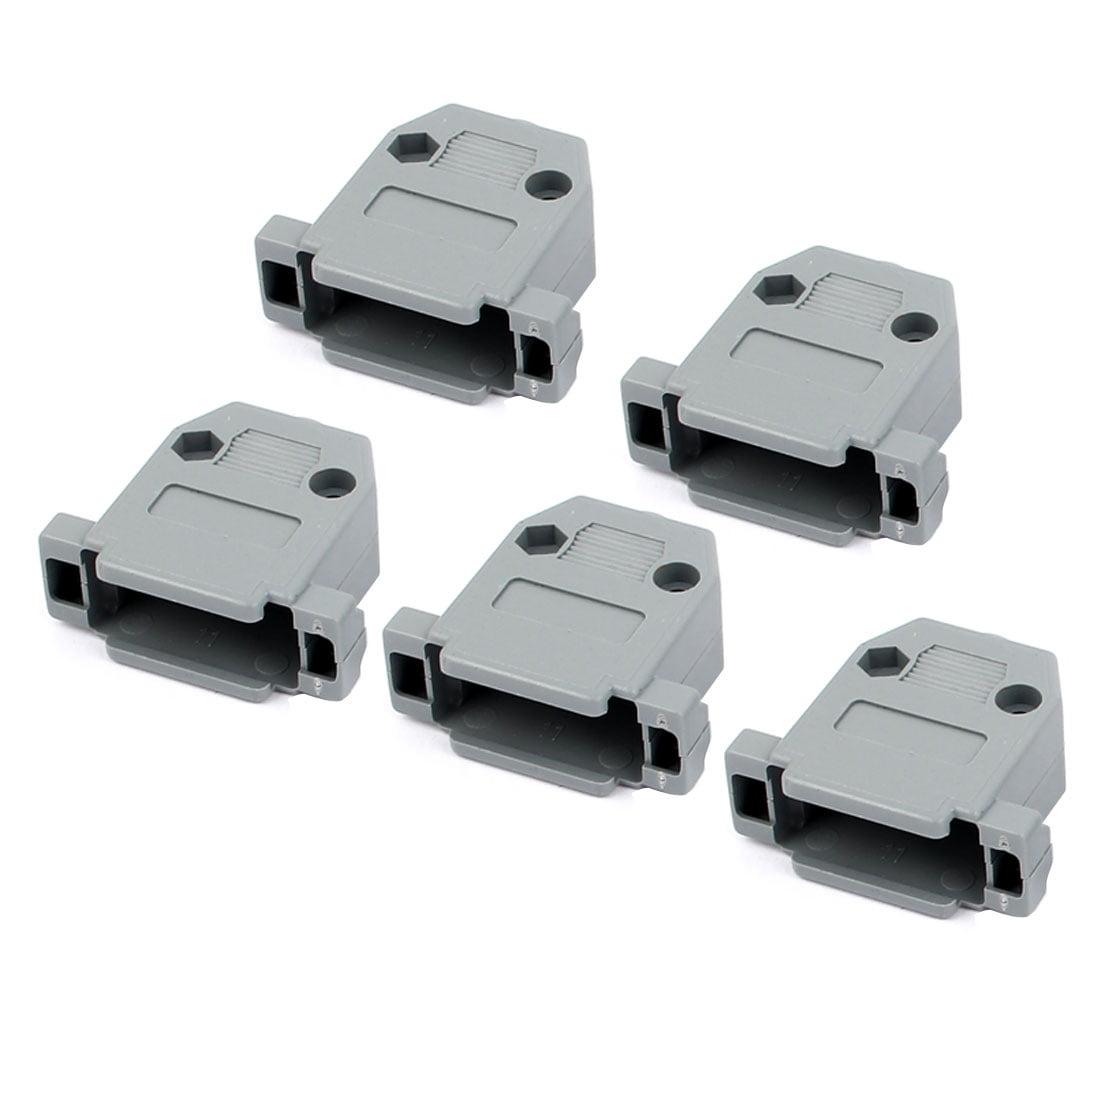 5 Pcs Plastic Serial Port D-Sub DB15 Connector Kit Backshell Gray w Screws